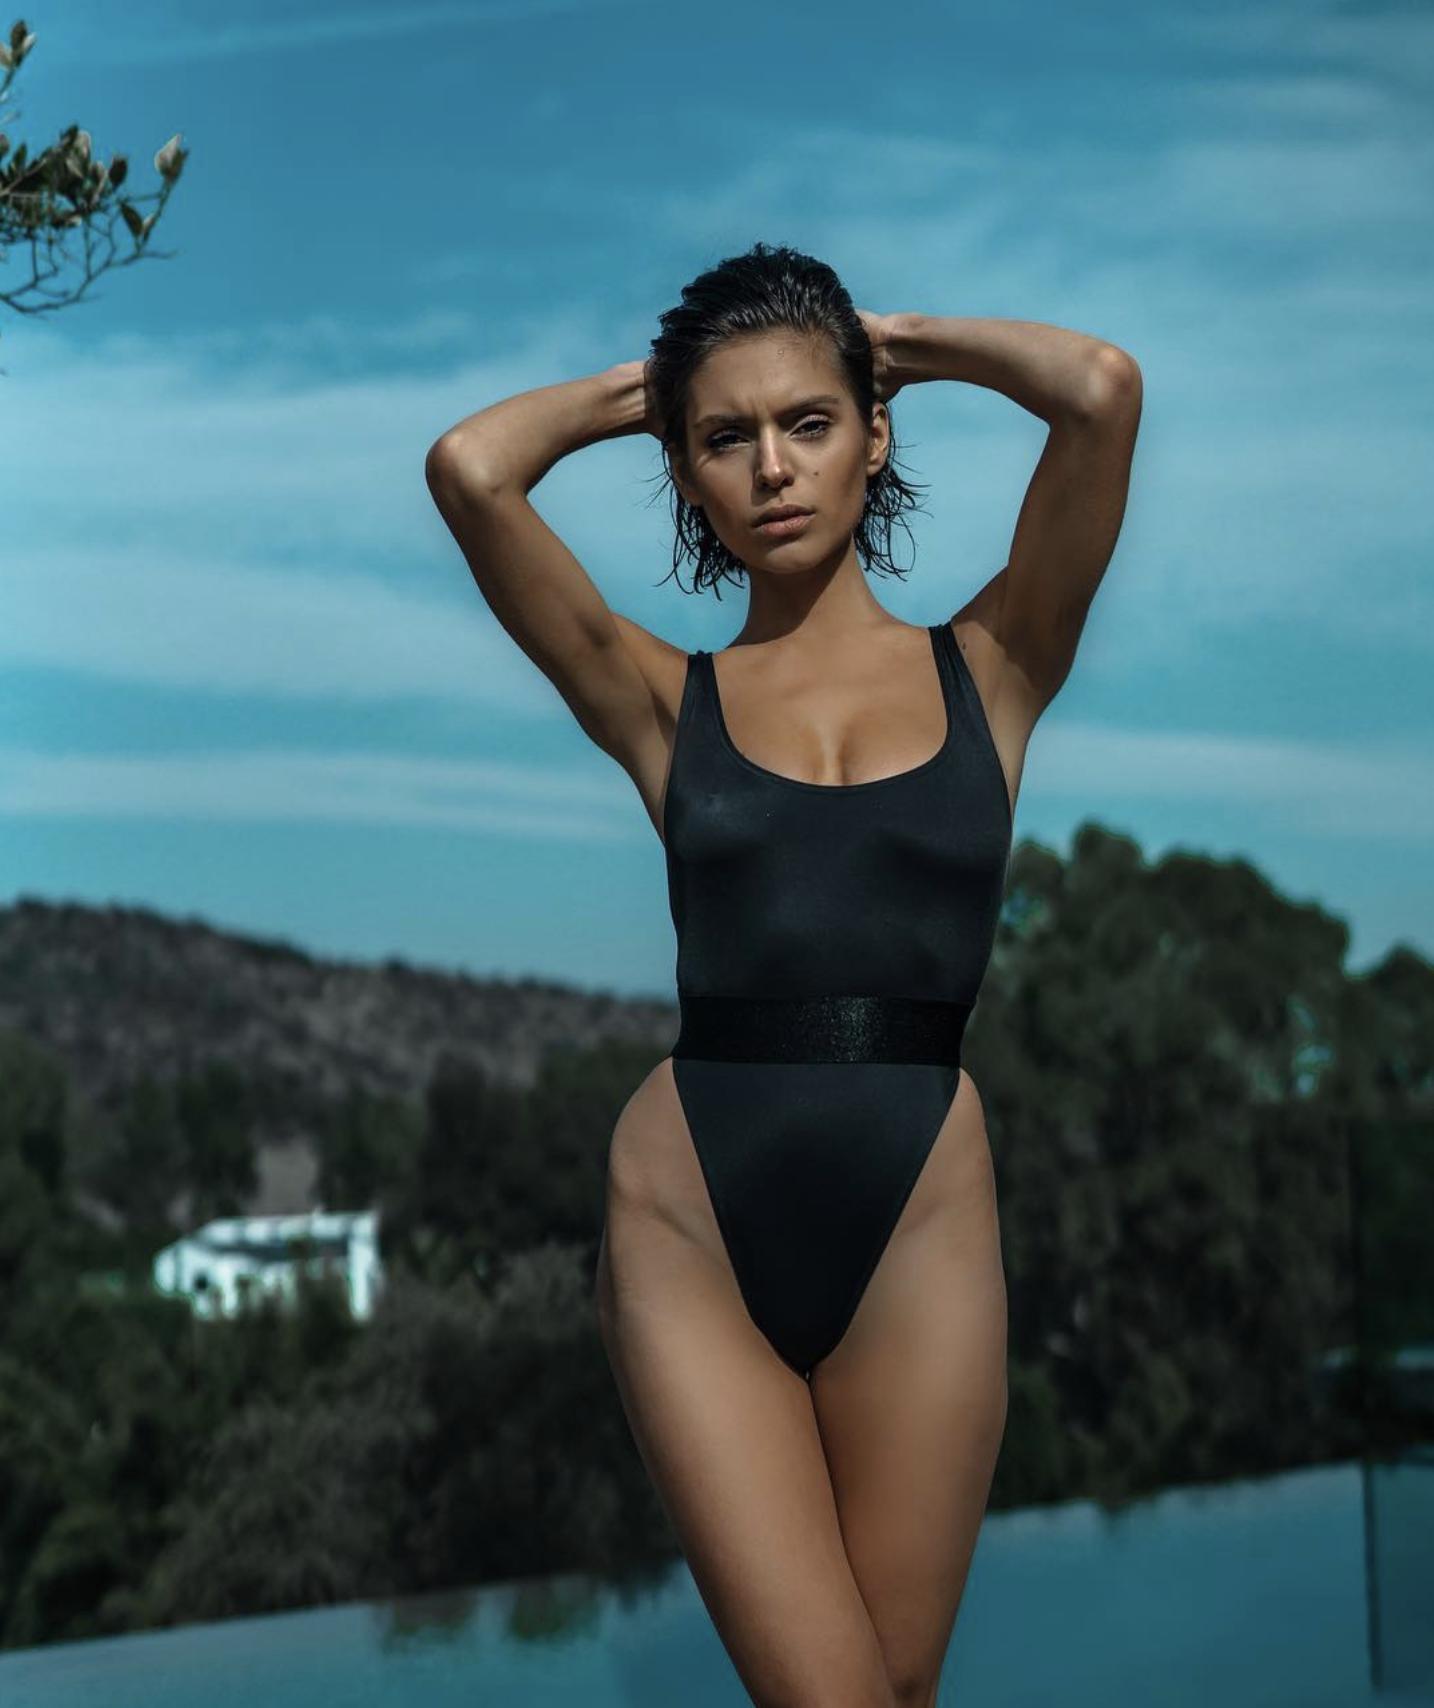 Hot Meghan Engler nude photos 2019